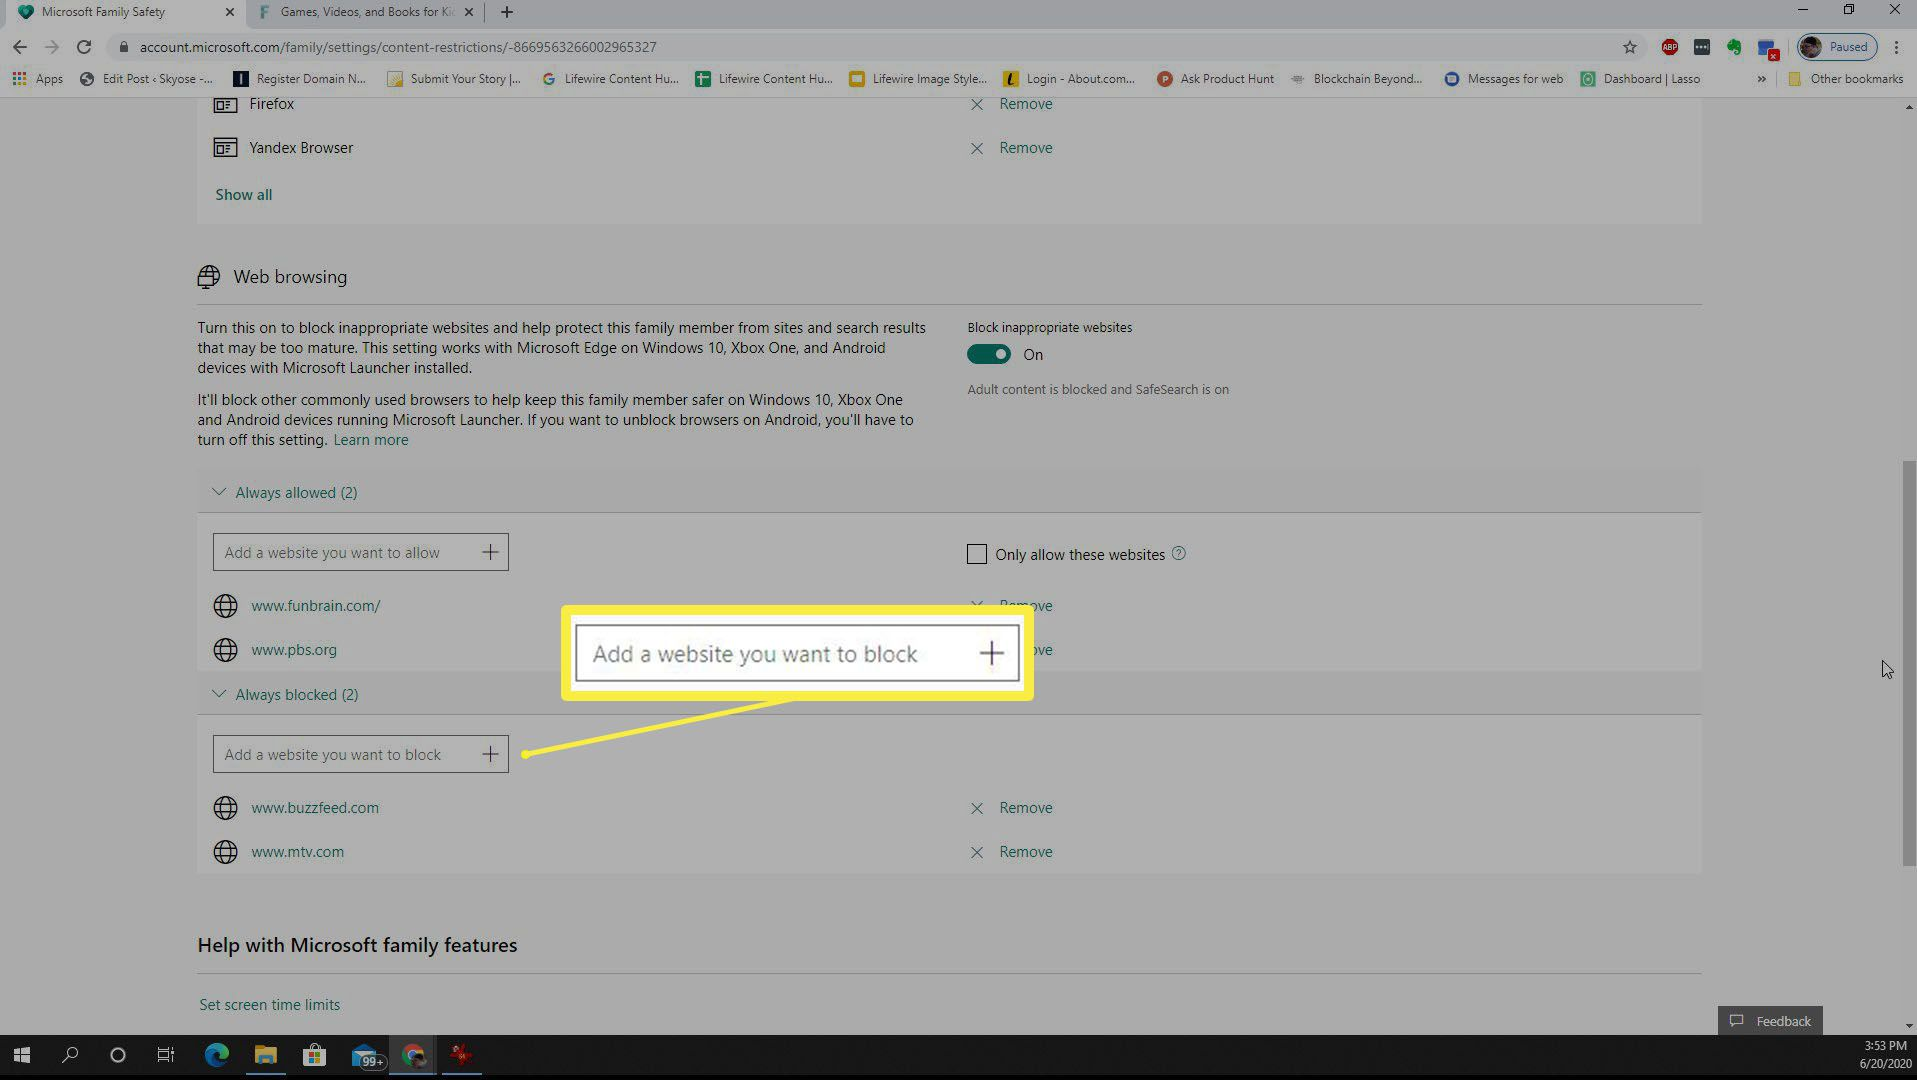 Screenshot of blocking websites in Microsoft Family Safety.